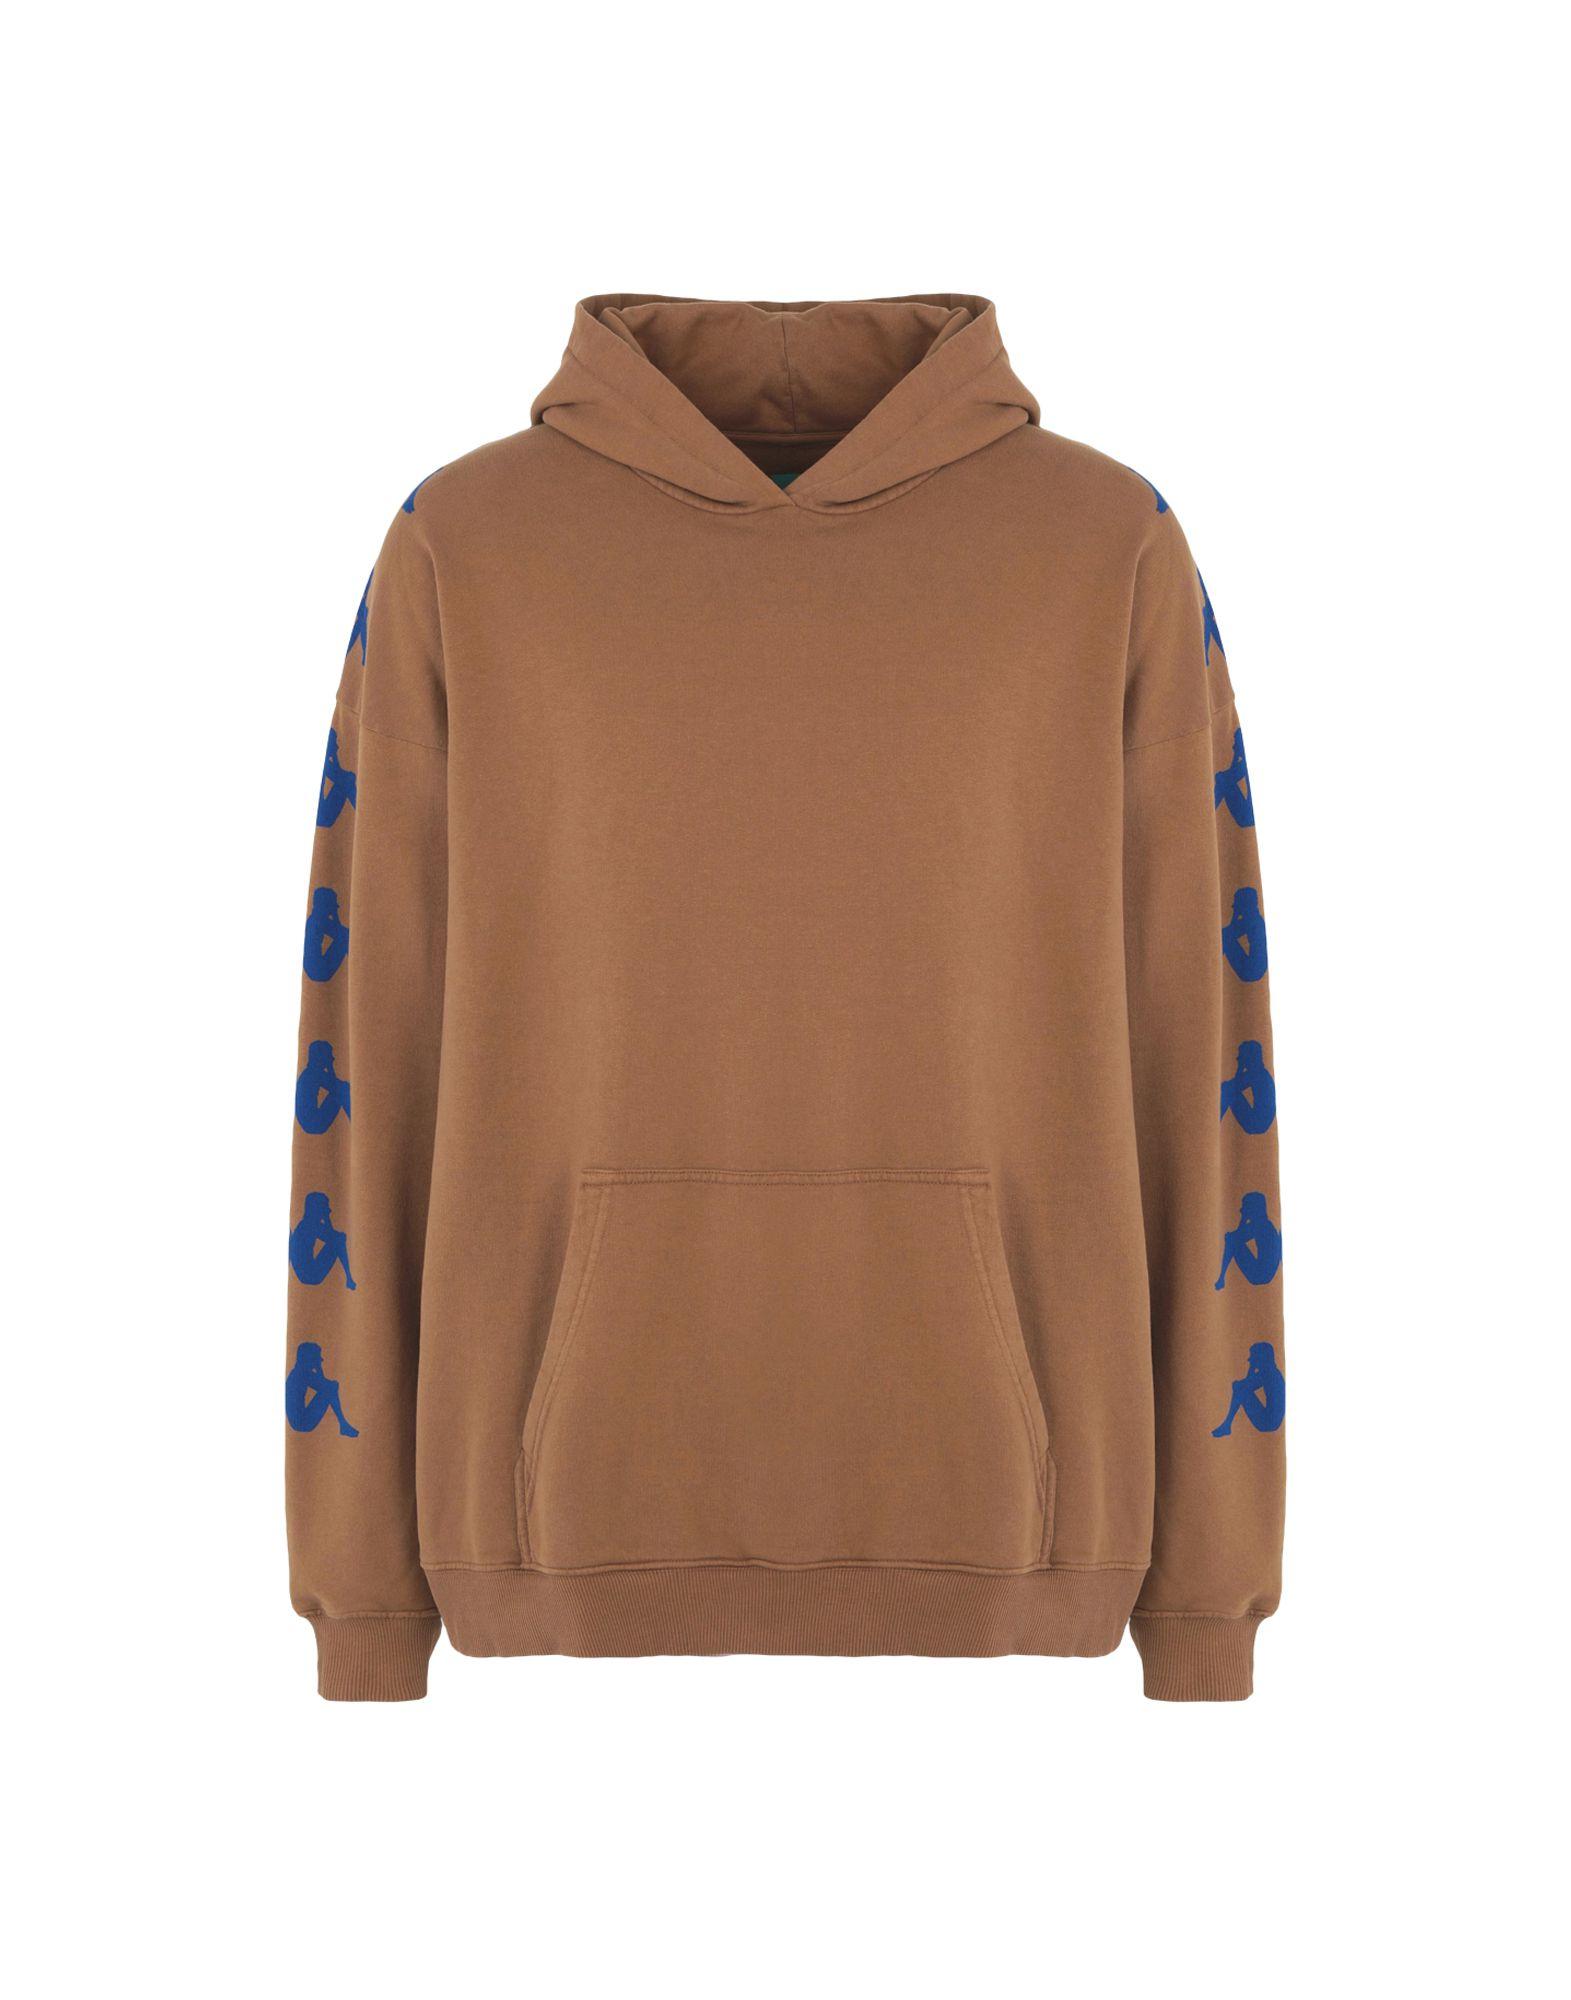 Kappa Hooded sweatshirt